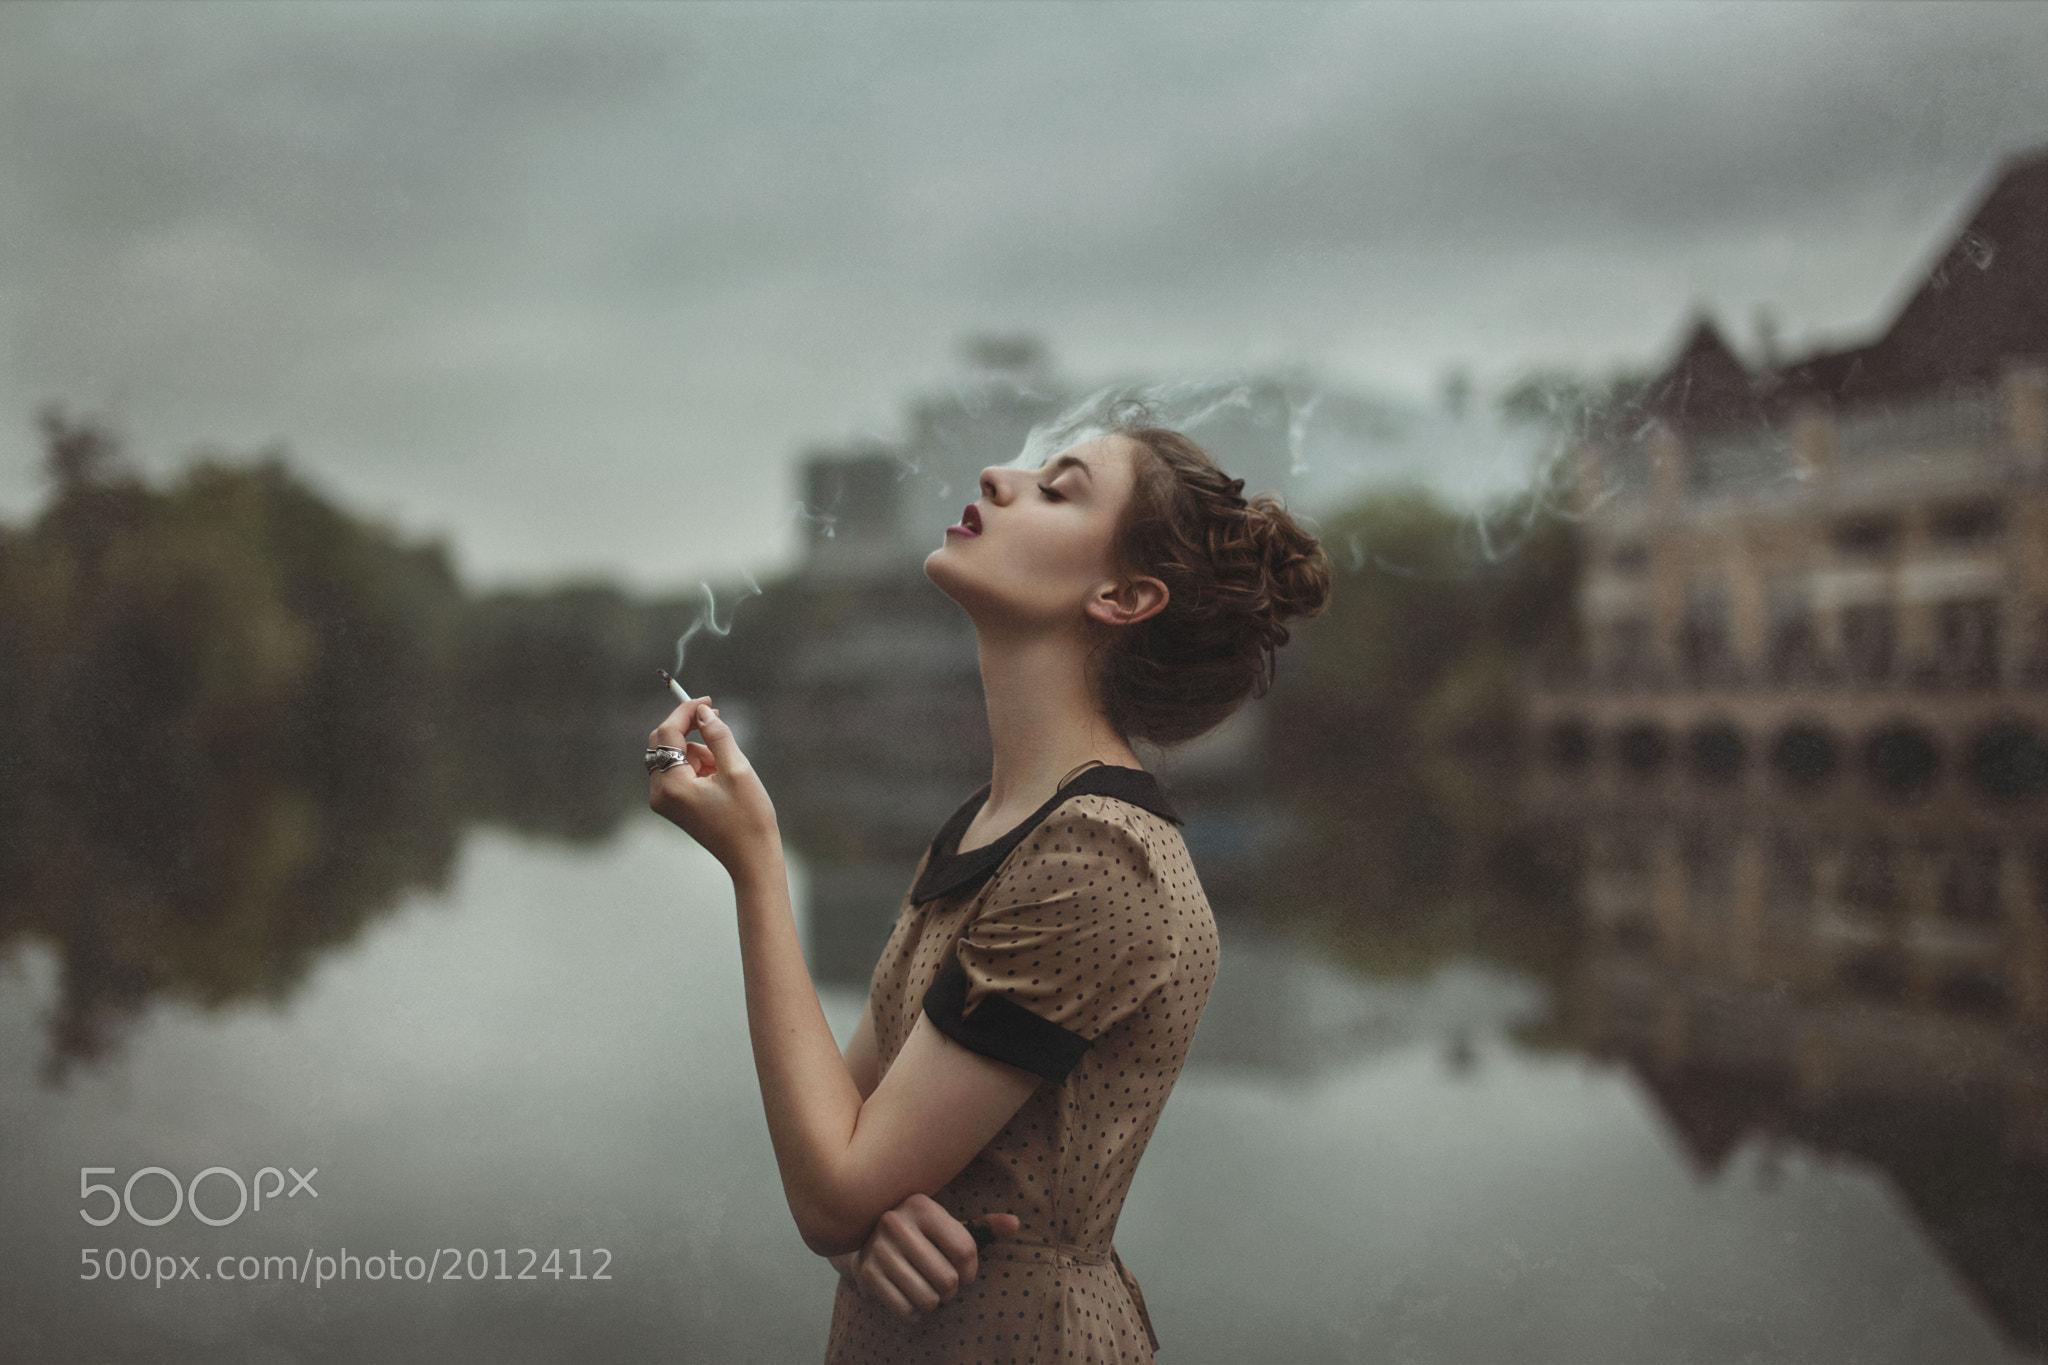 Photograph 1 by Aleksandr Munaev on 500px